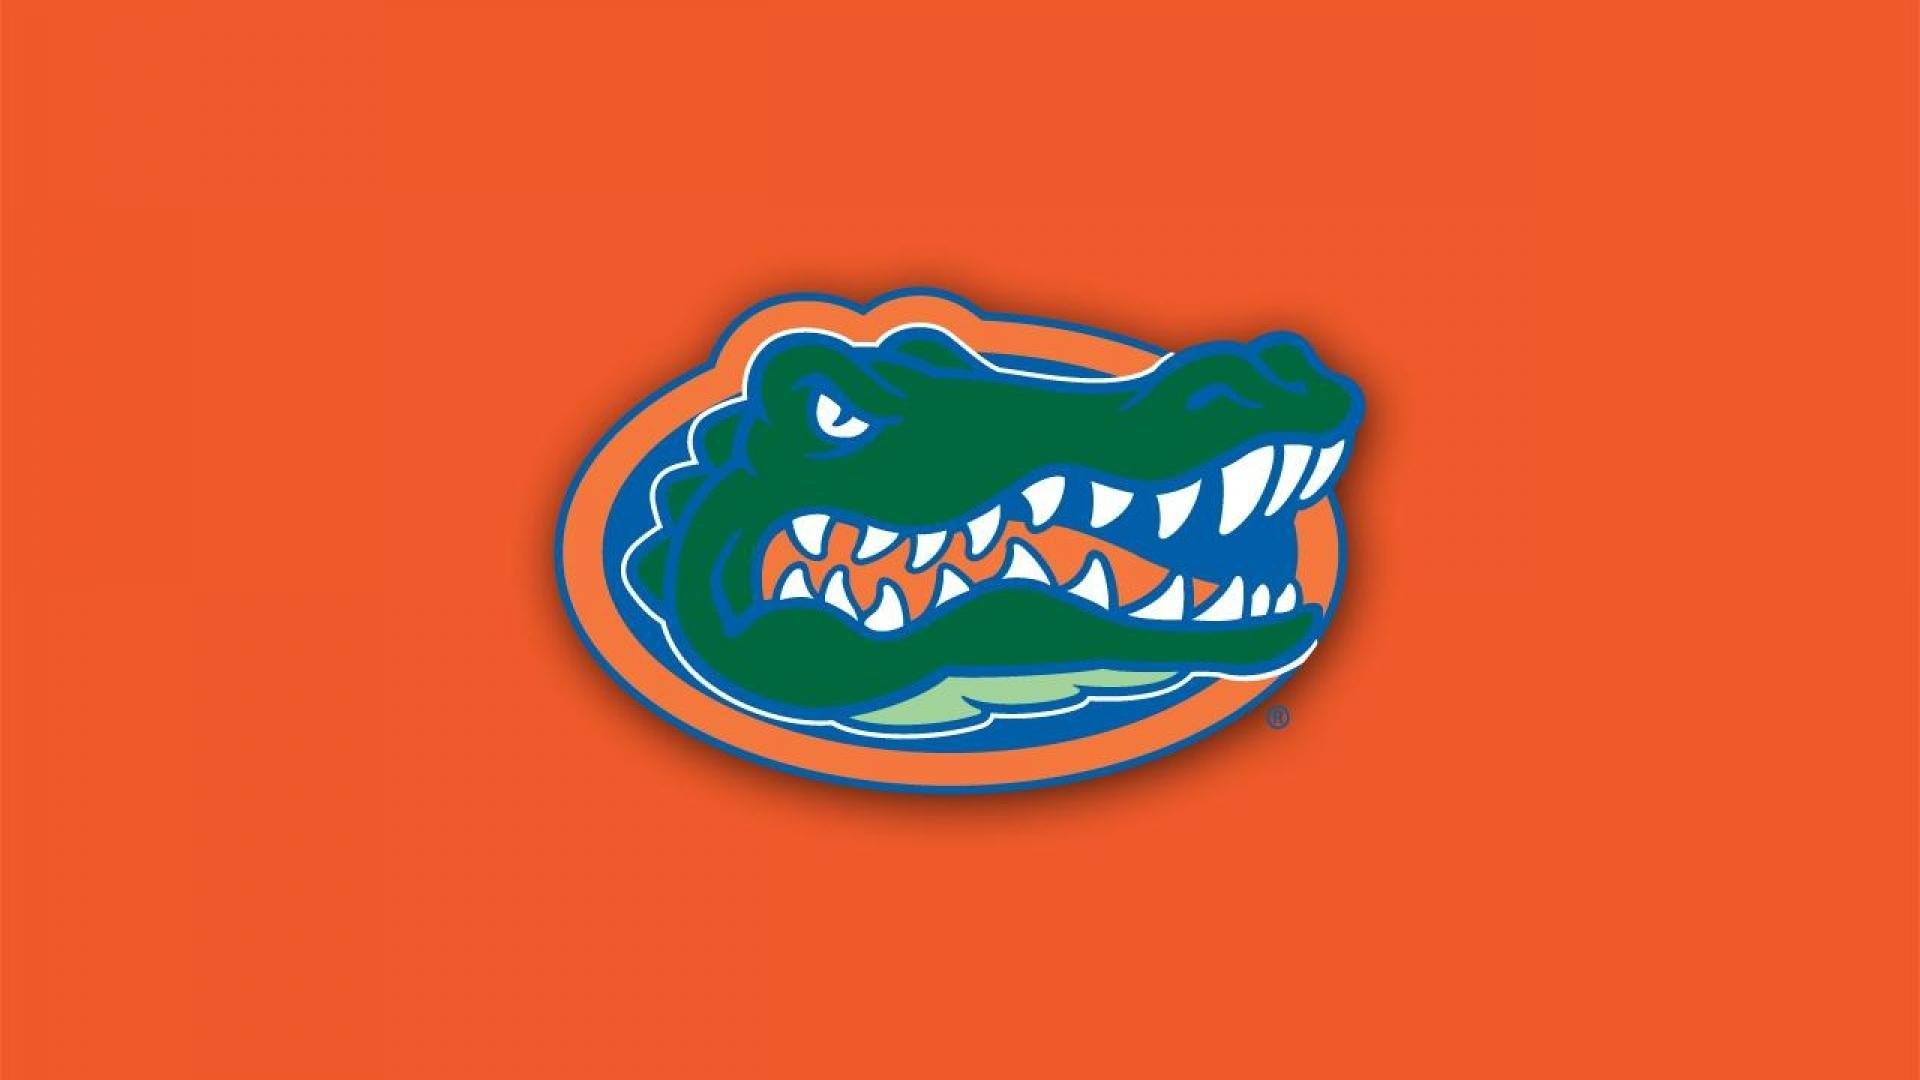 Florida Gators Football Wallpapers Wallpapertag